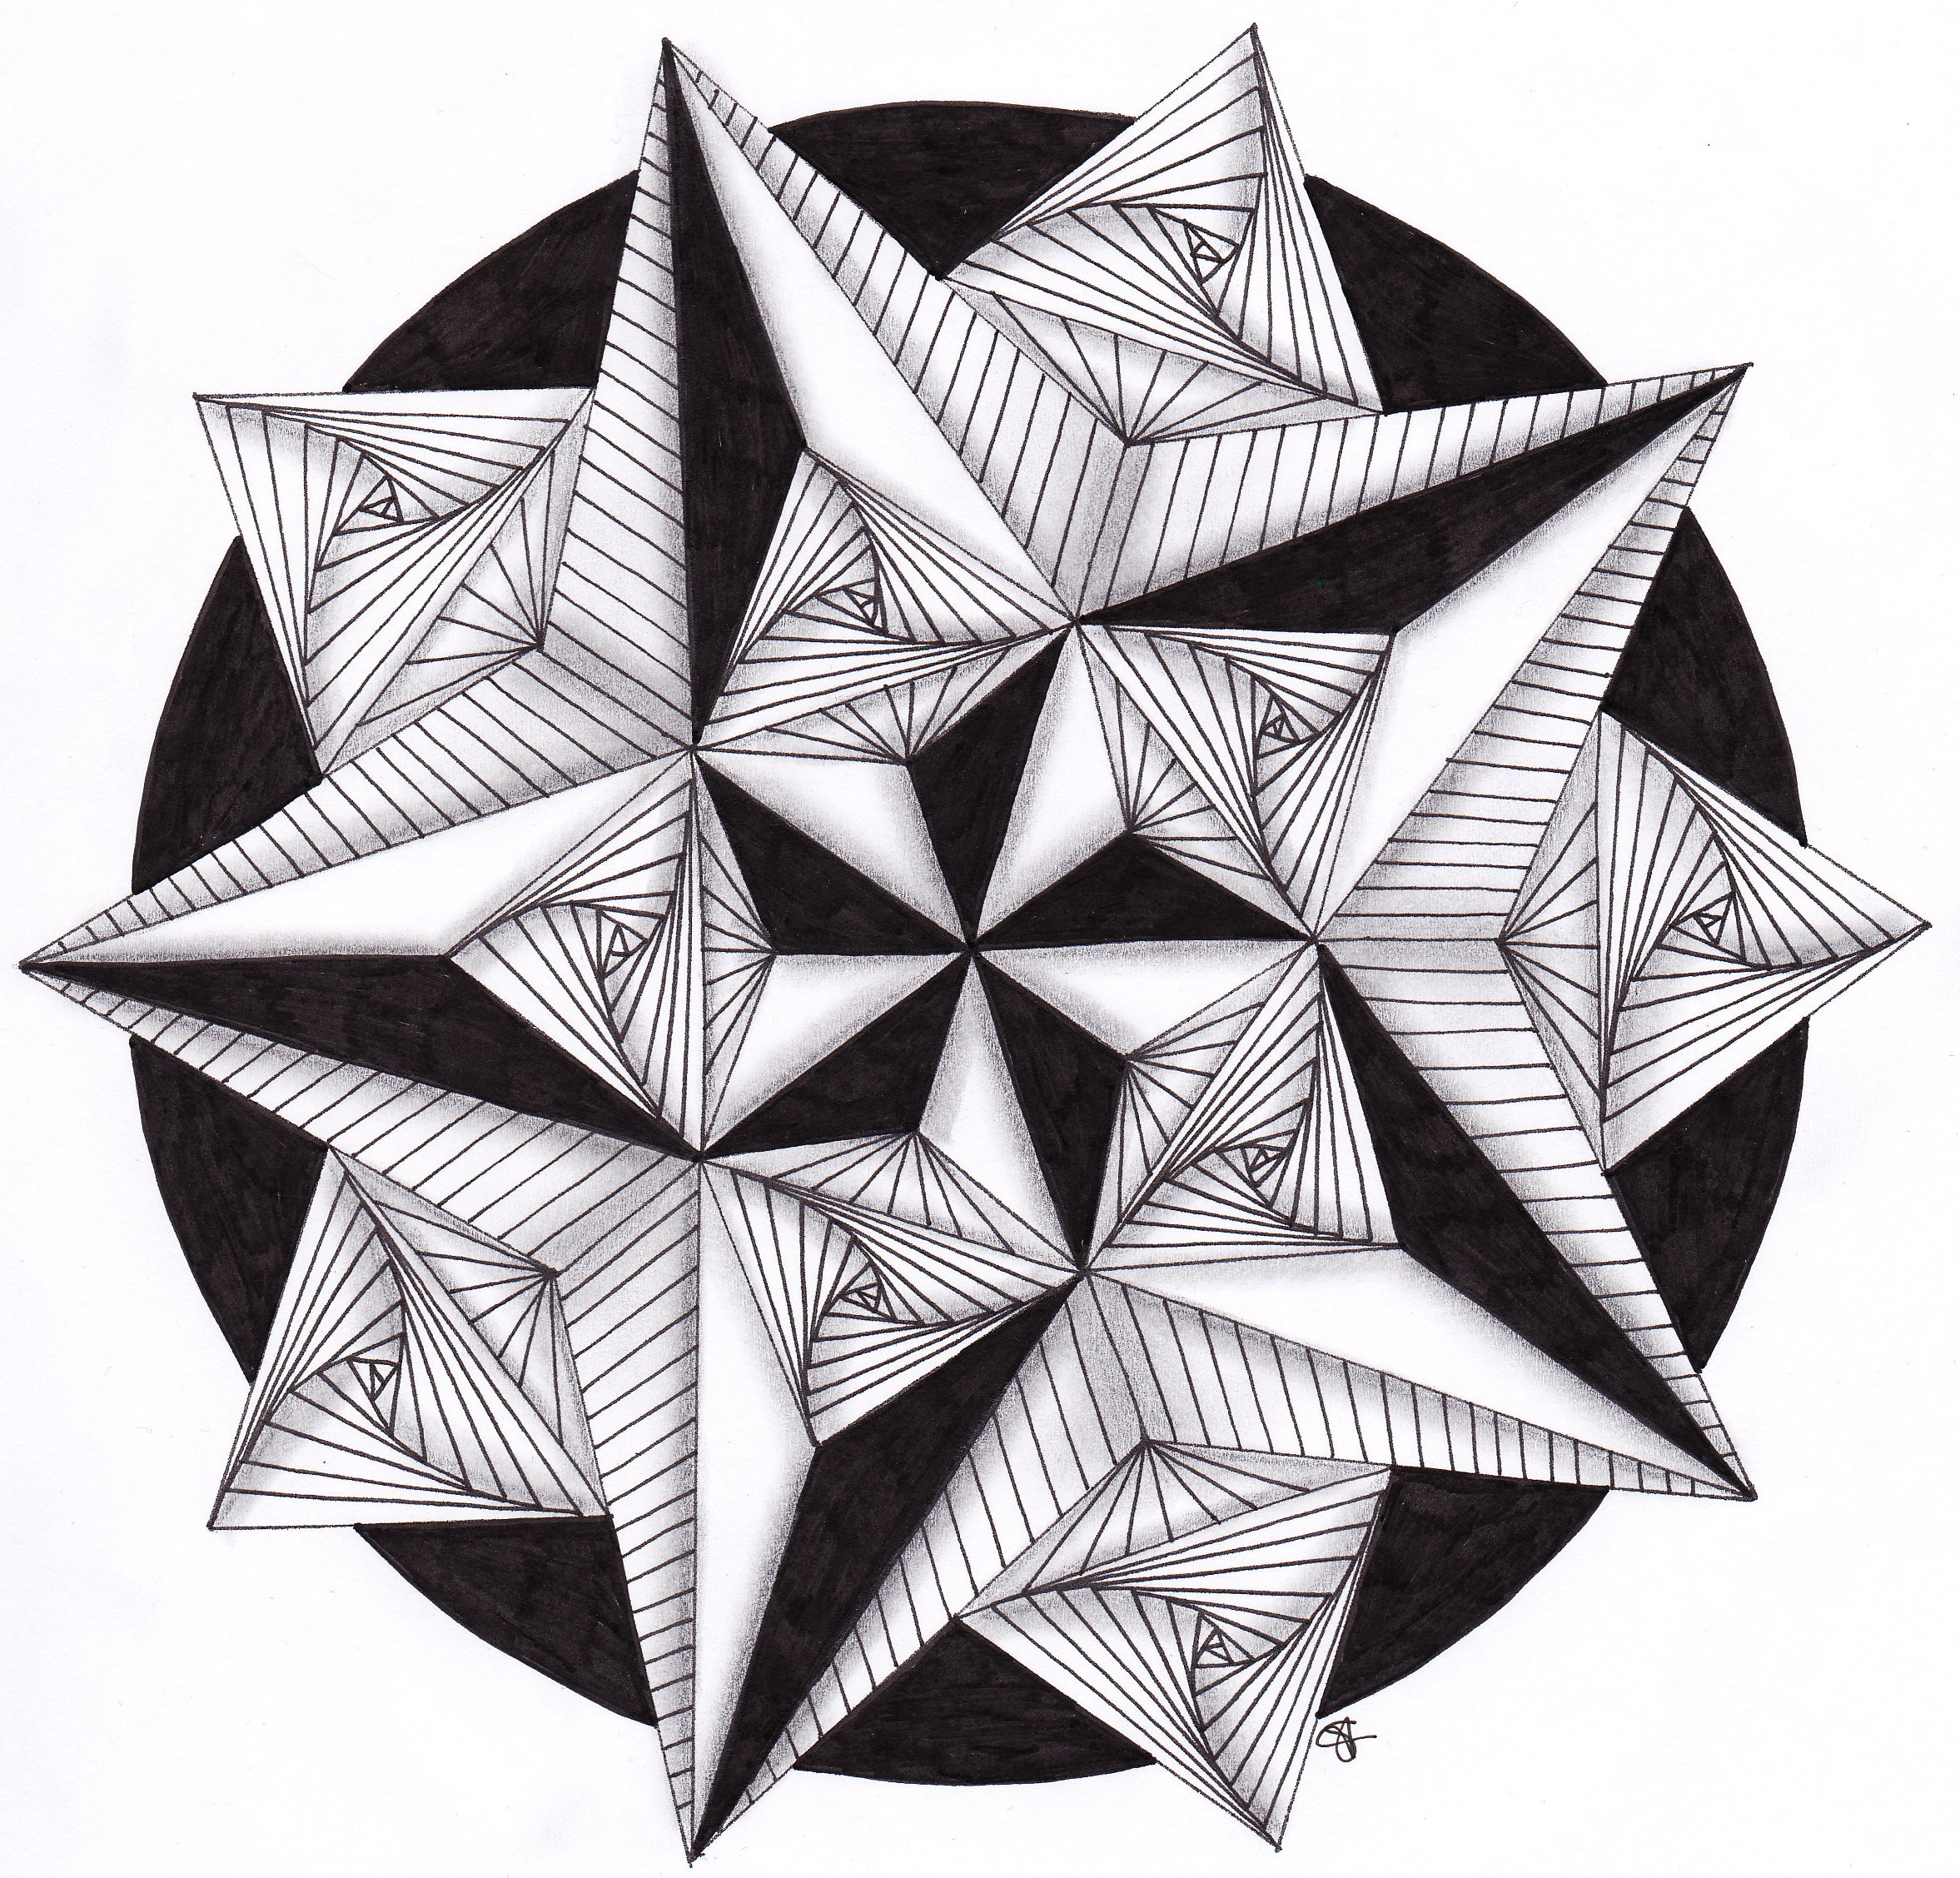 Drawn stare symmetrical With  paradox Hand drawn